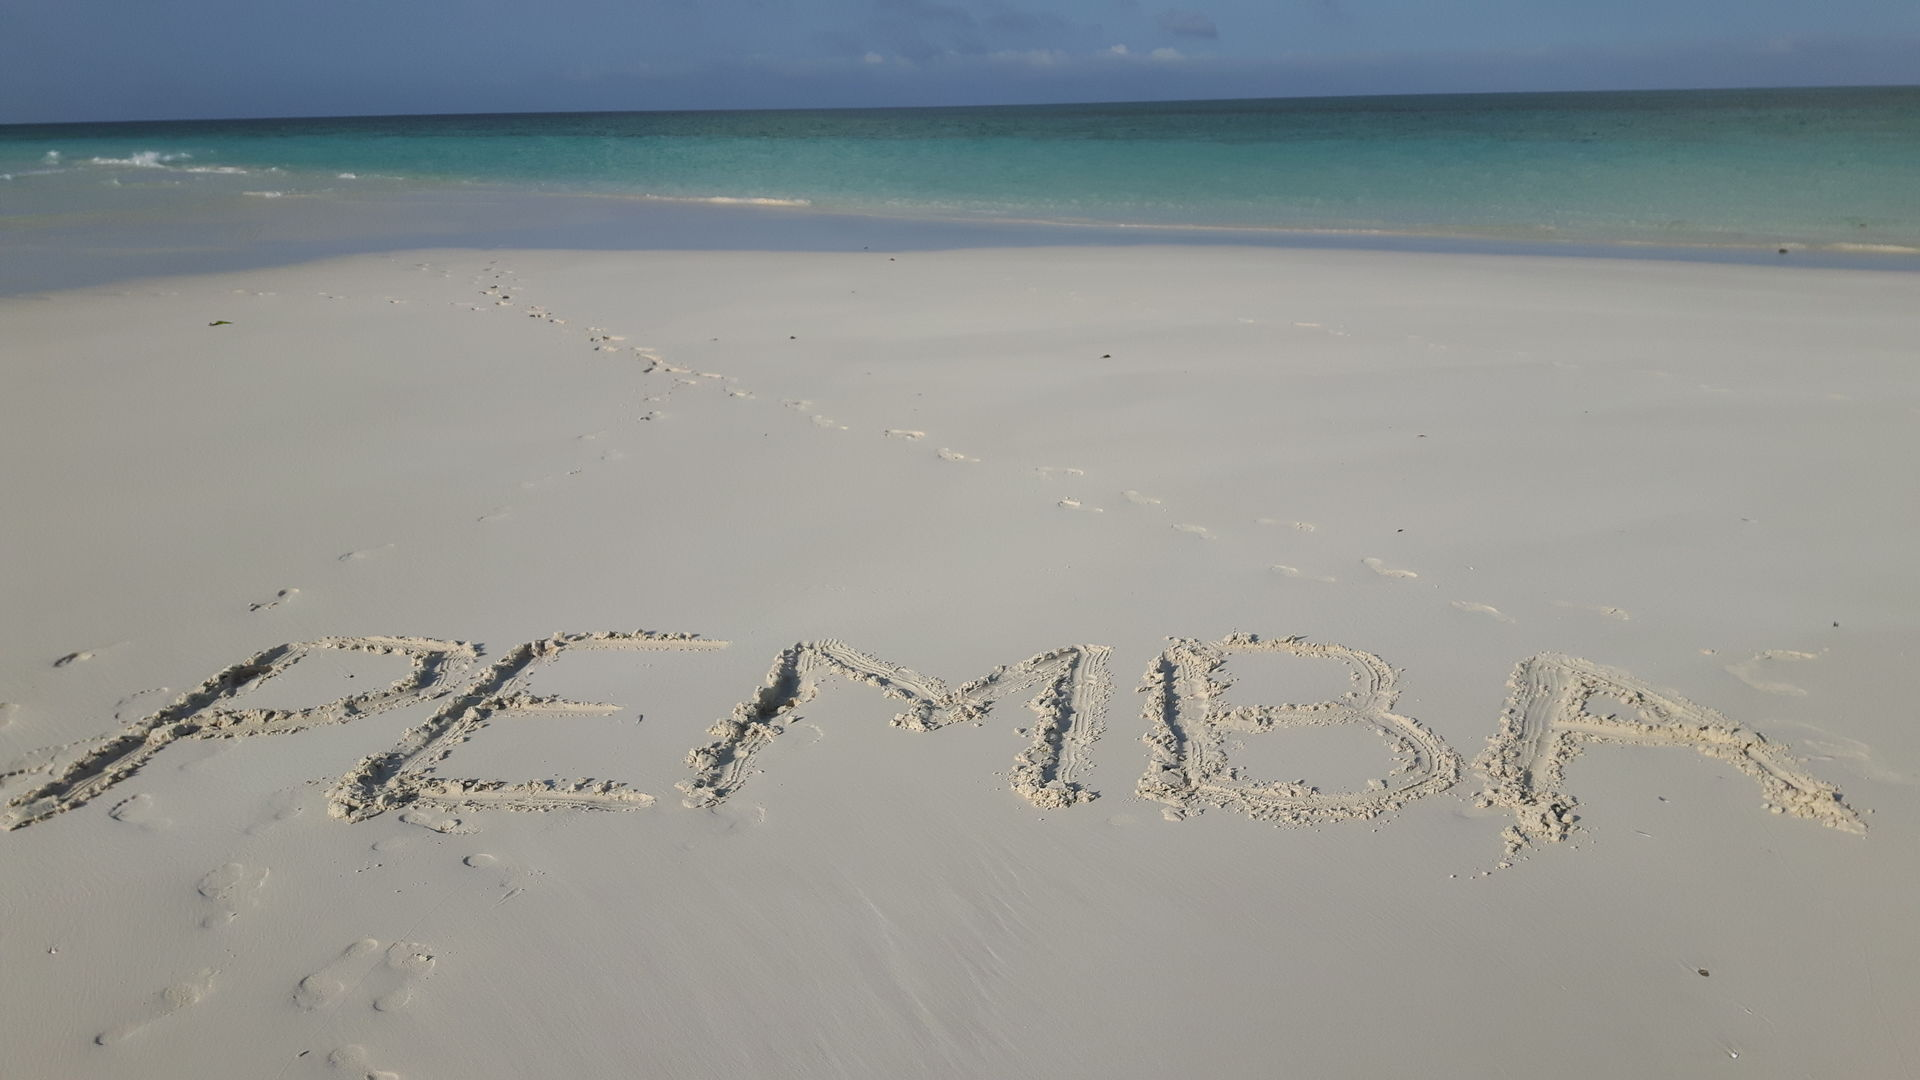 Pemba vakantie - Reizen naar Pemba Afrika   Matoke Tours